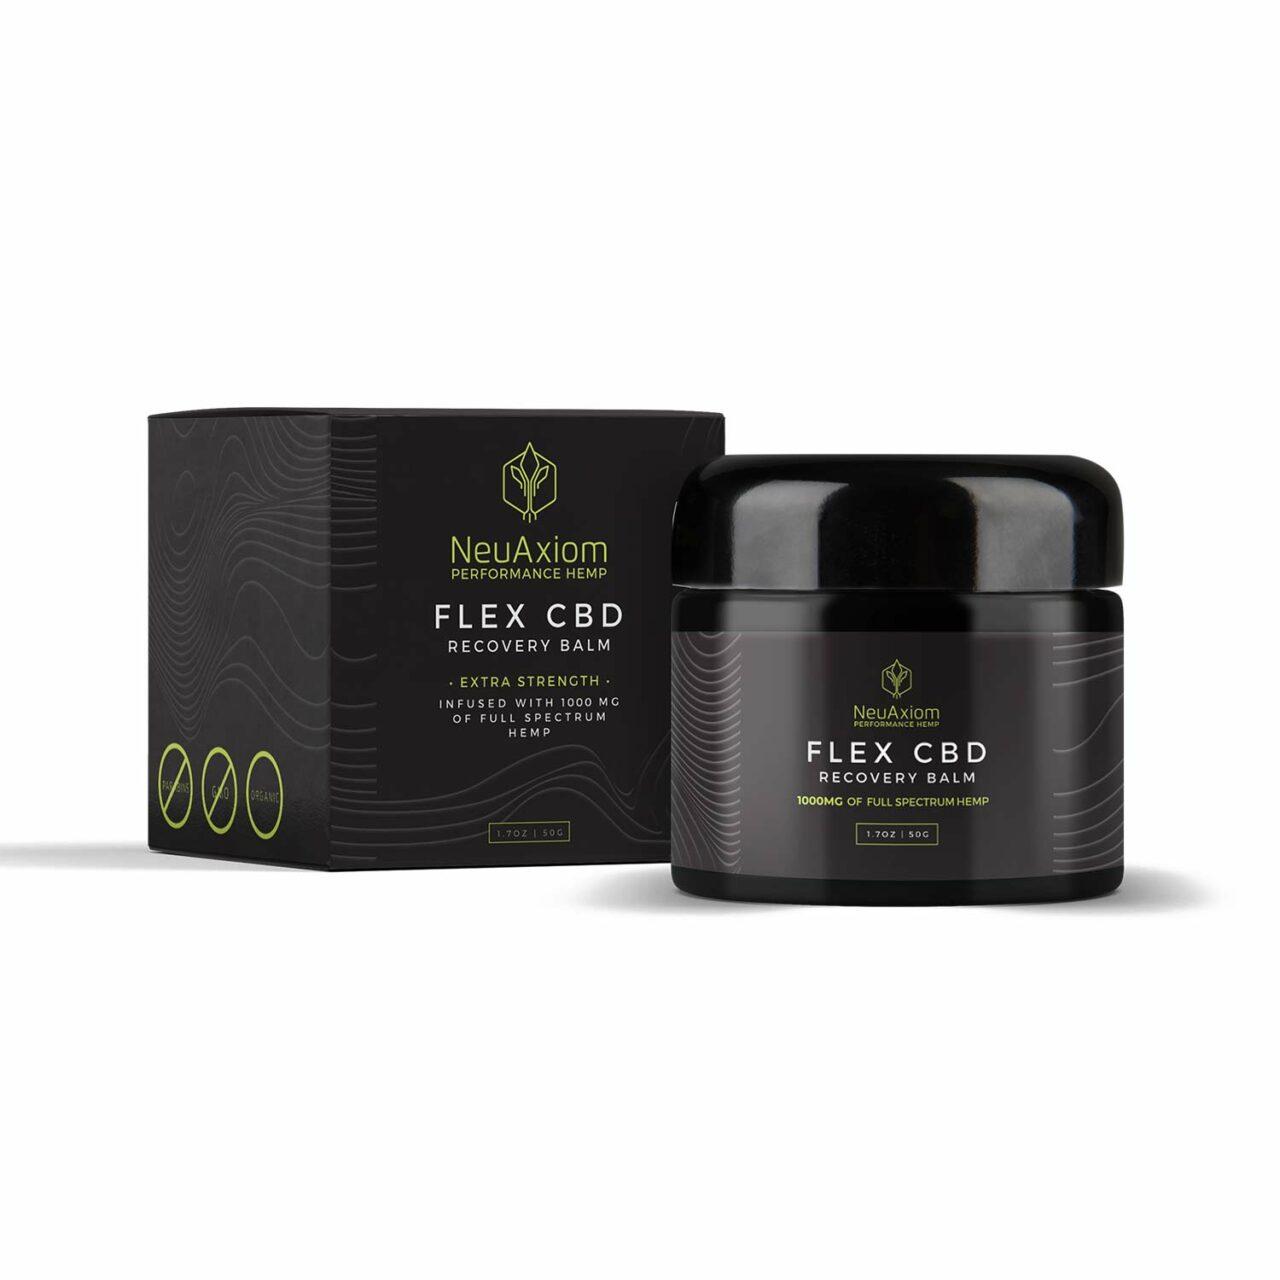 neuaxiom-flex-cbd-recovery-balm-1-7oz-1000mg-of-cbd